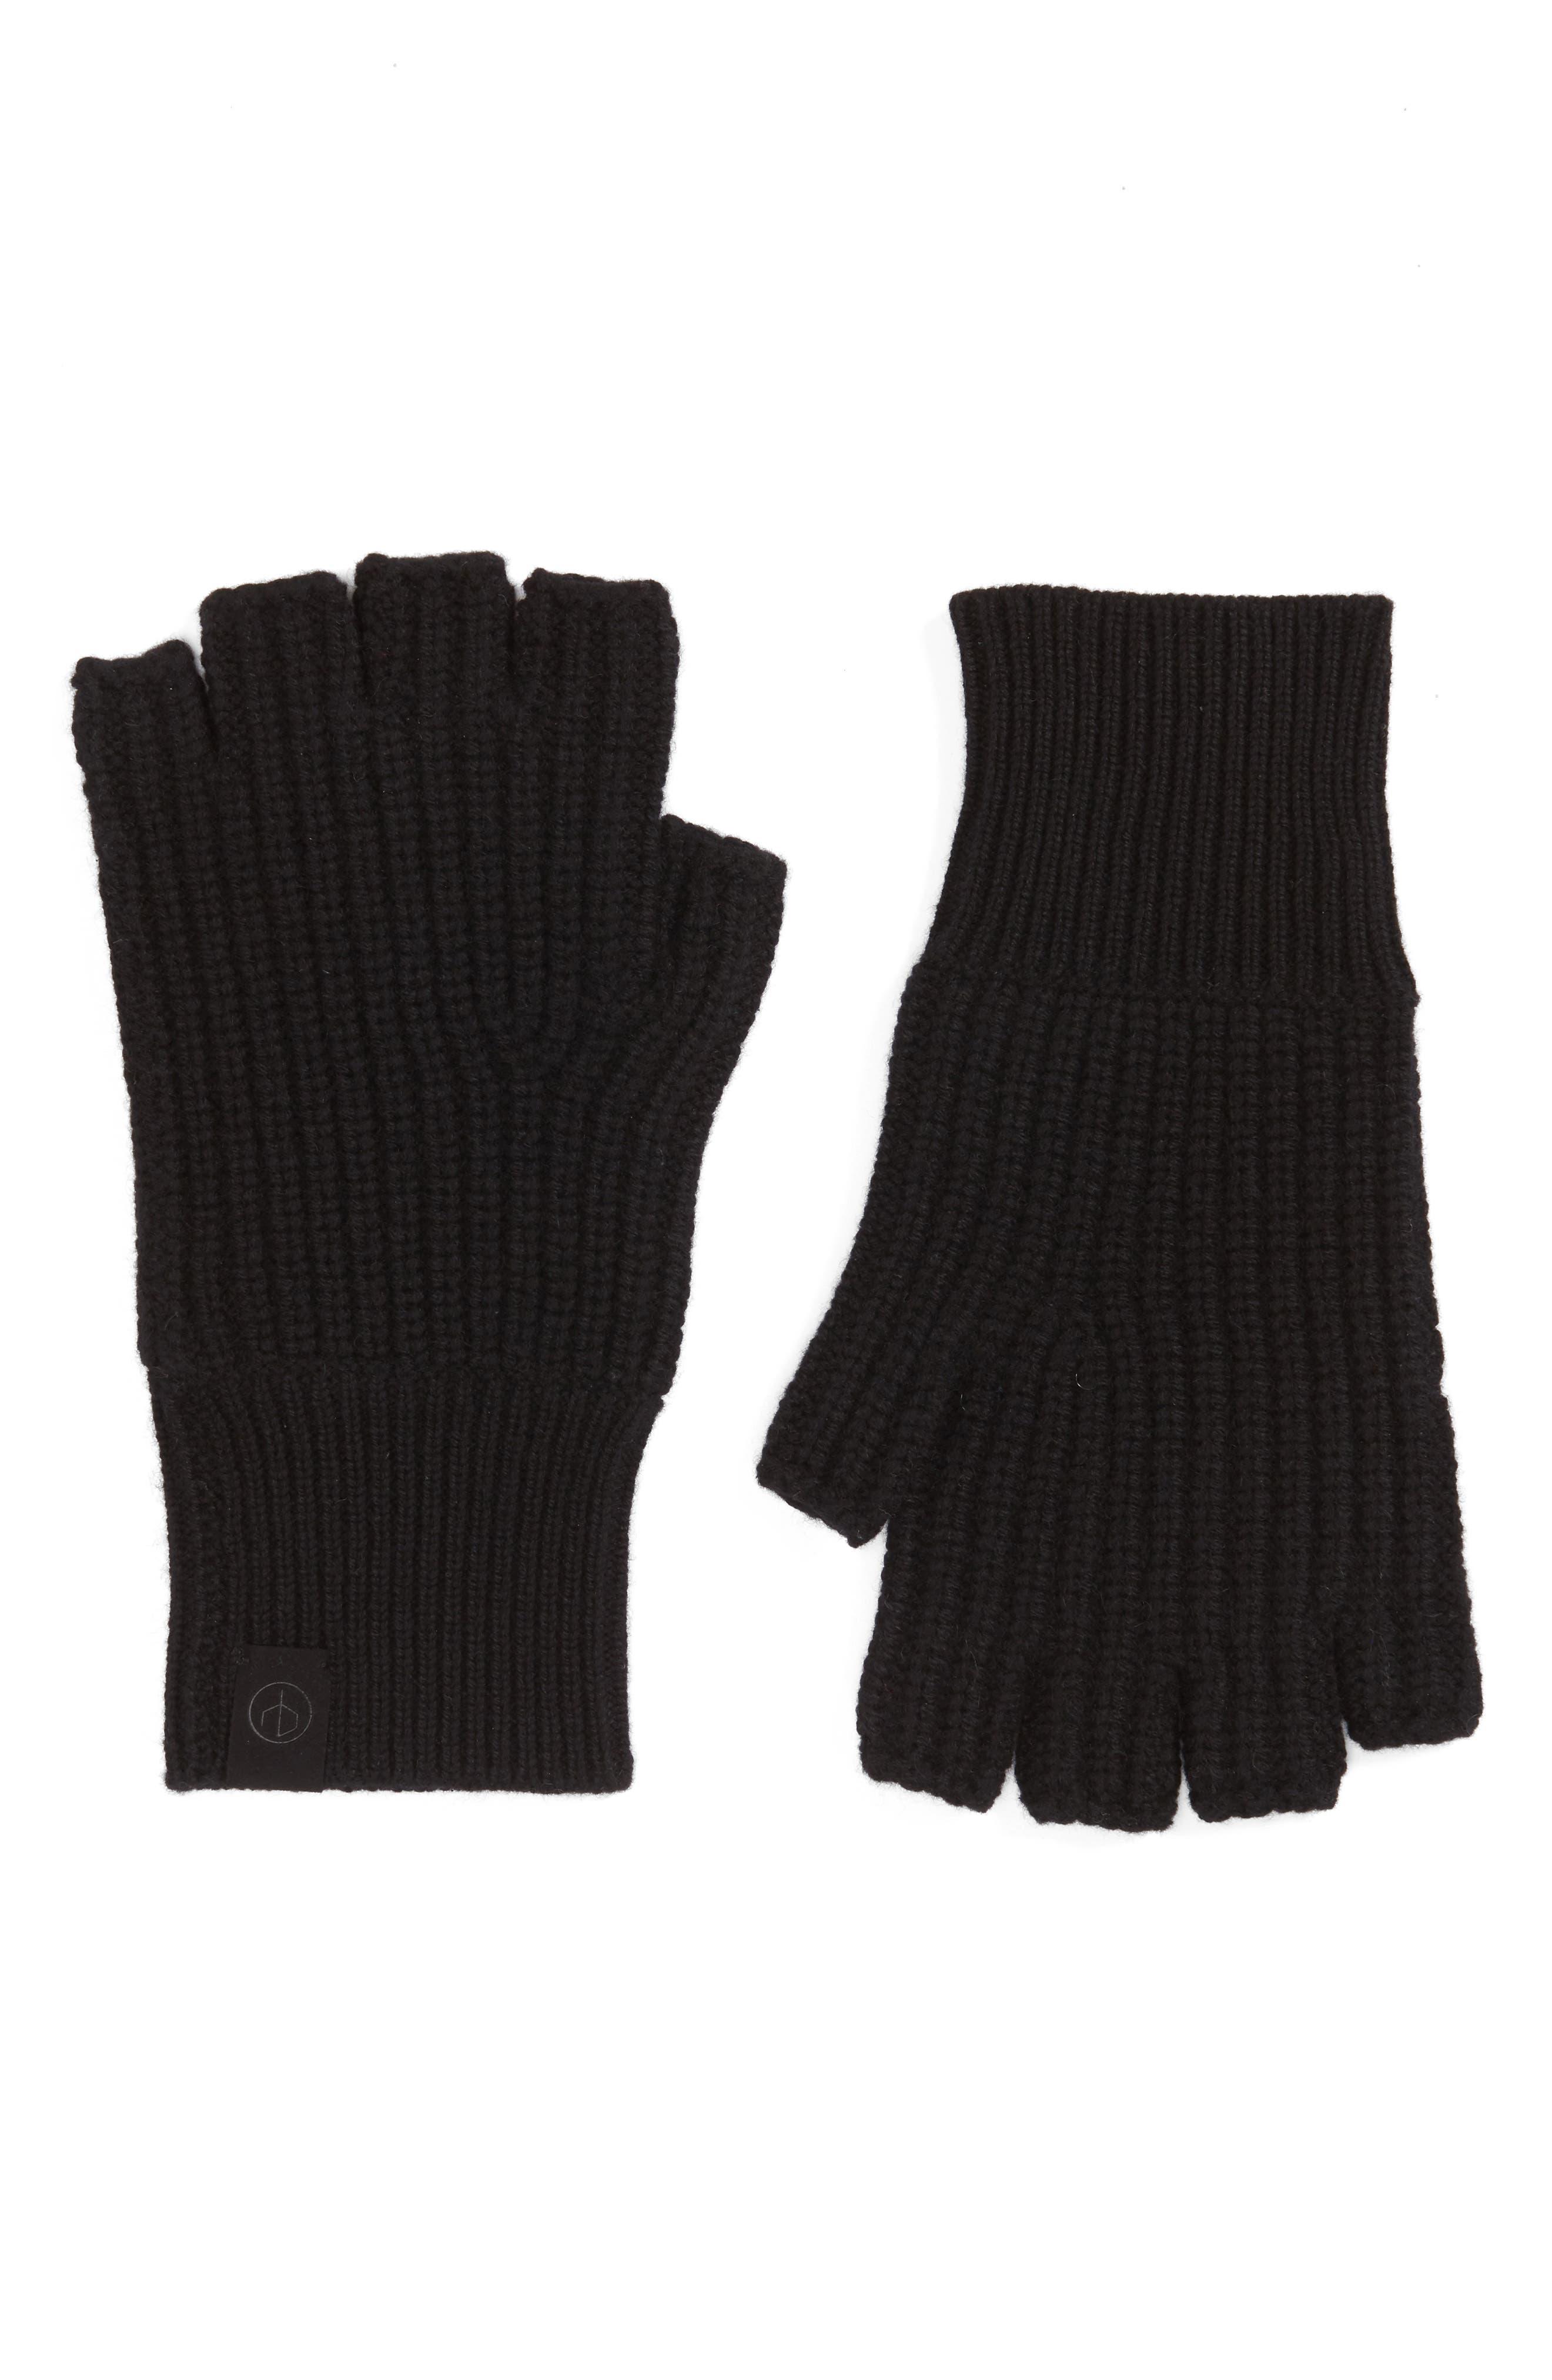 Ace Cashmere Knit Fingerless Gloves,                         Main,                         color, Black